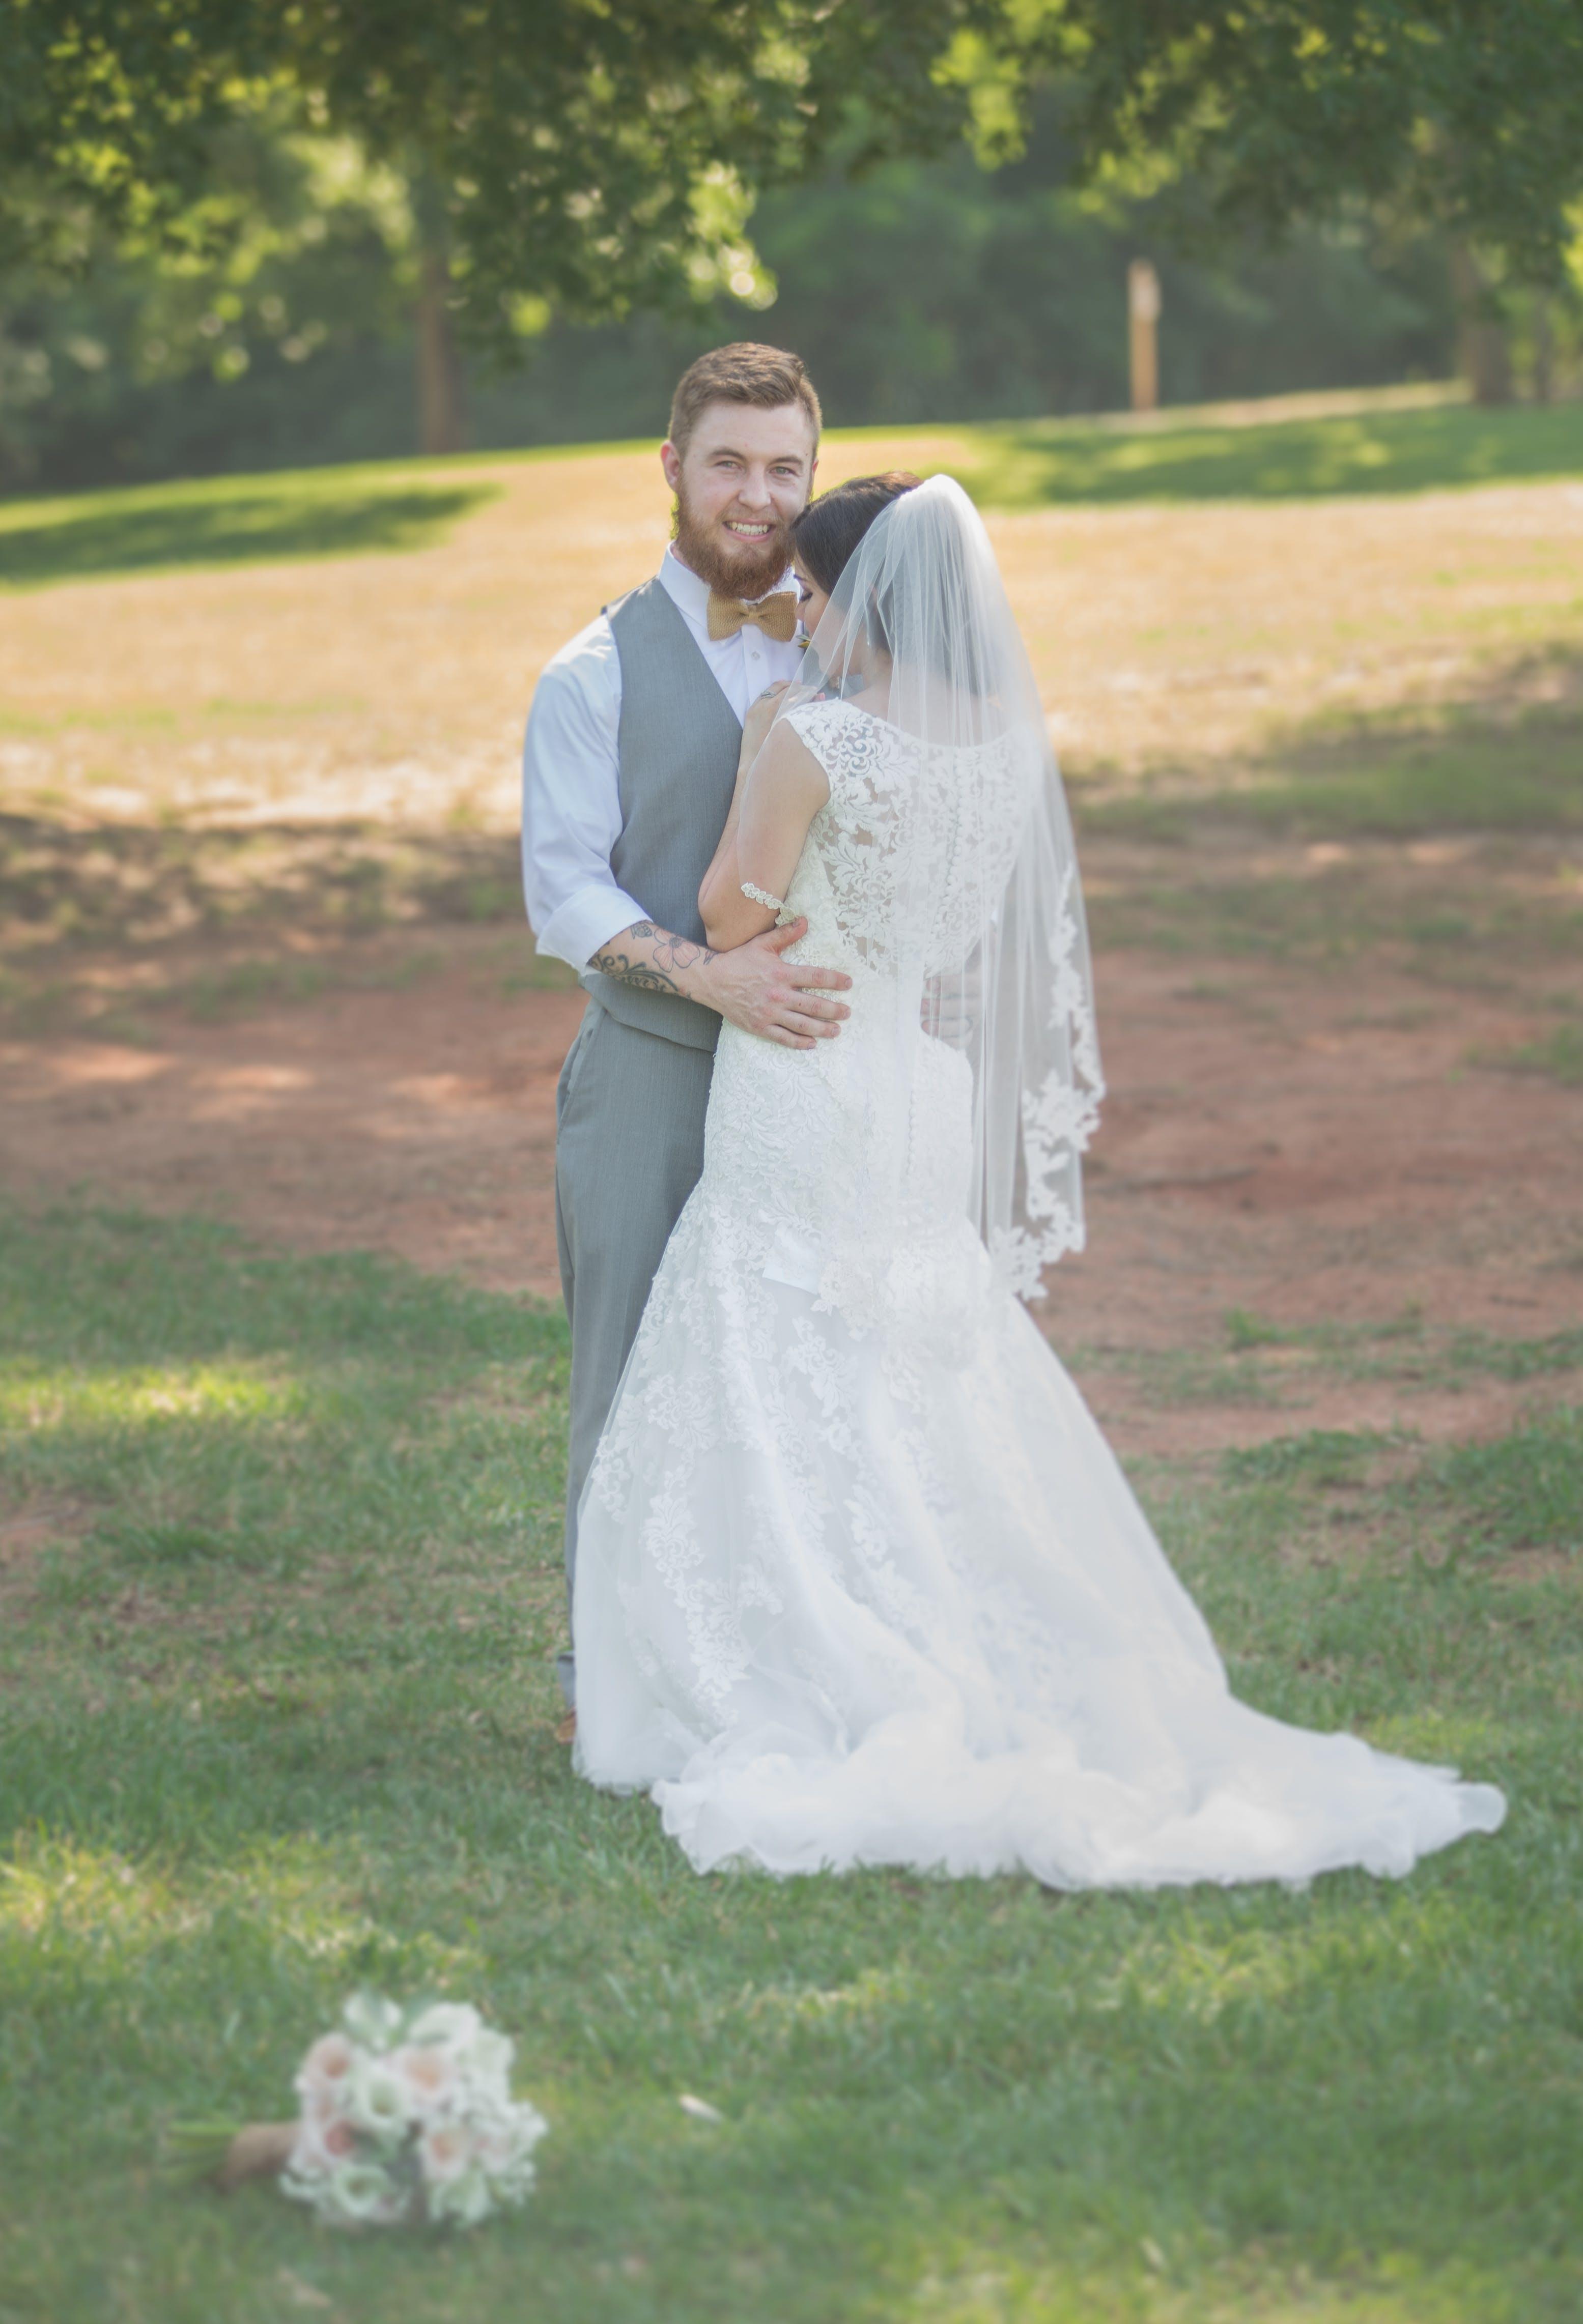 Free stock photo of bride, groom, outdoorwedding, wedding